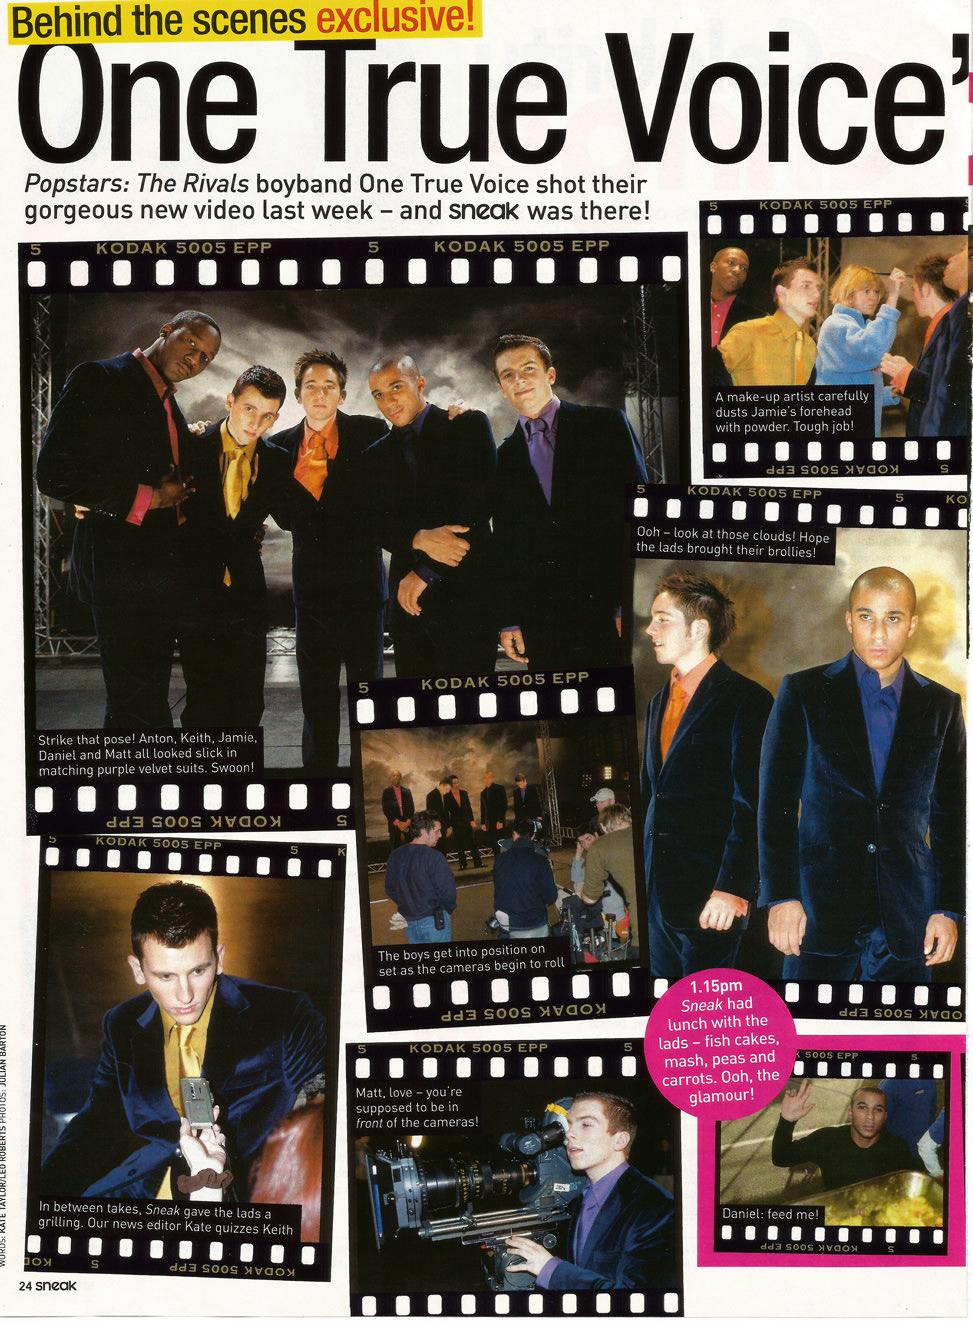 One True Voice magazine article